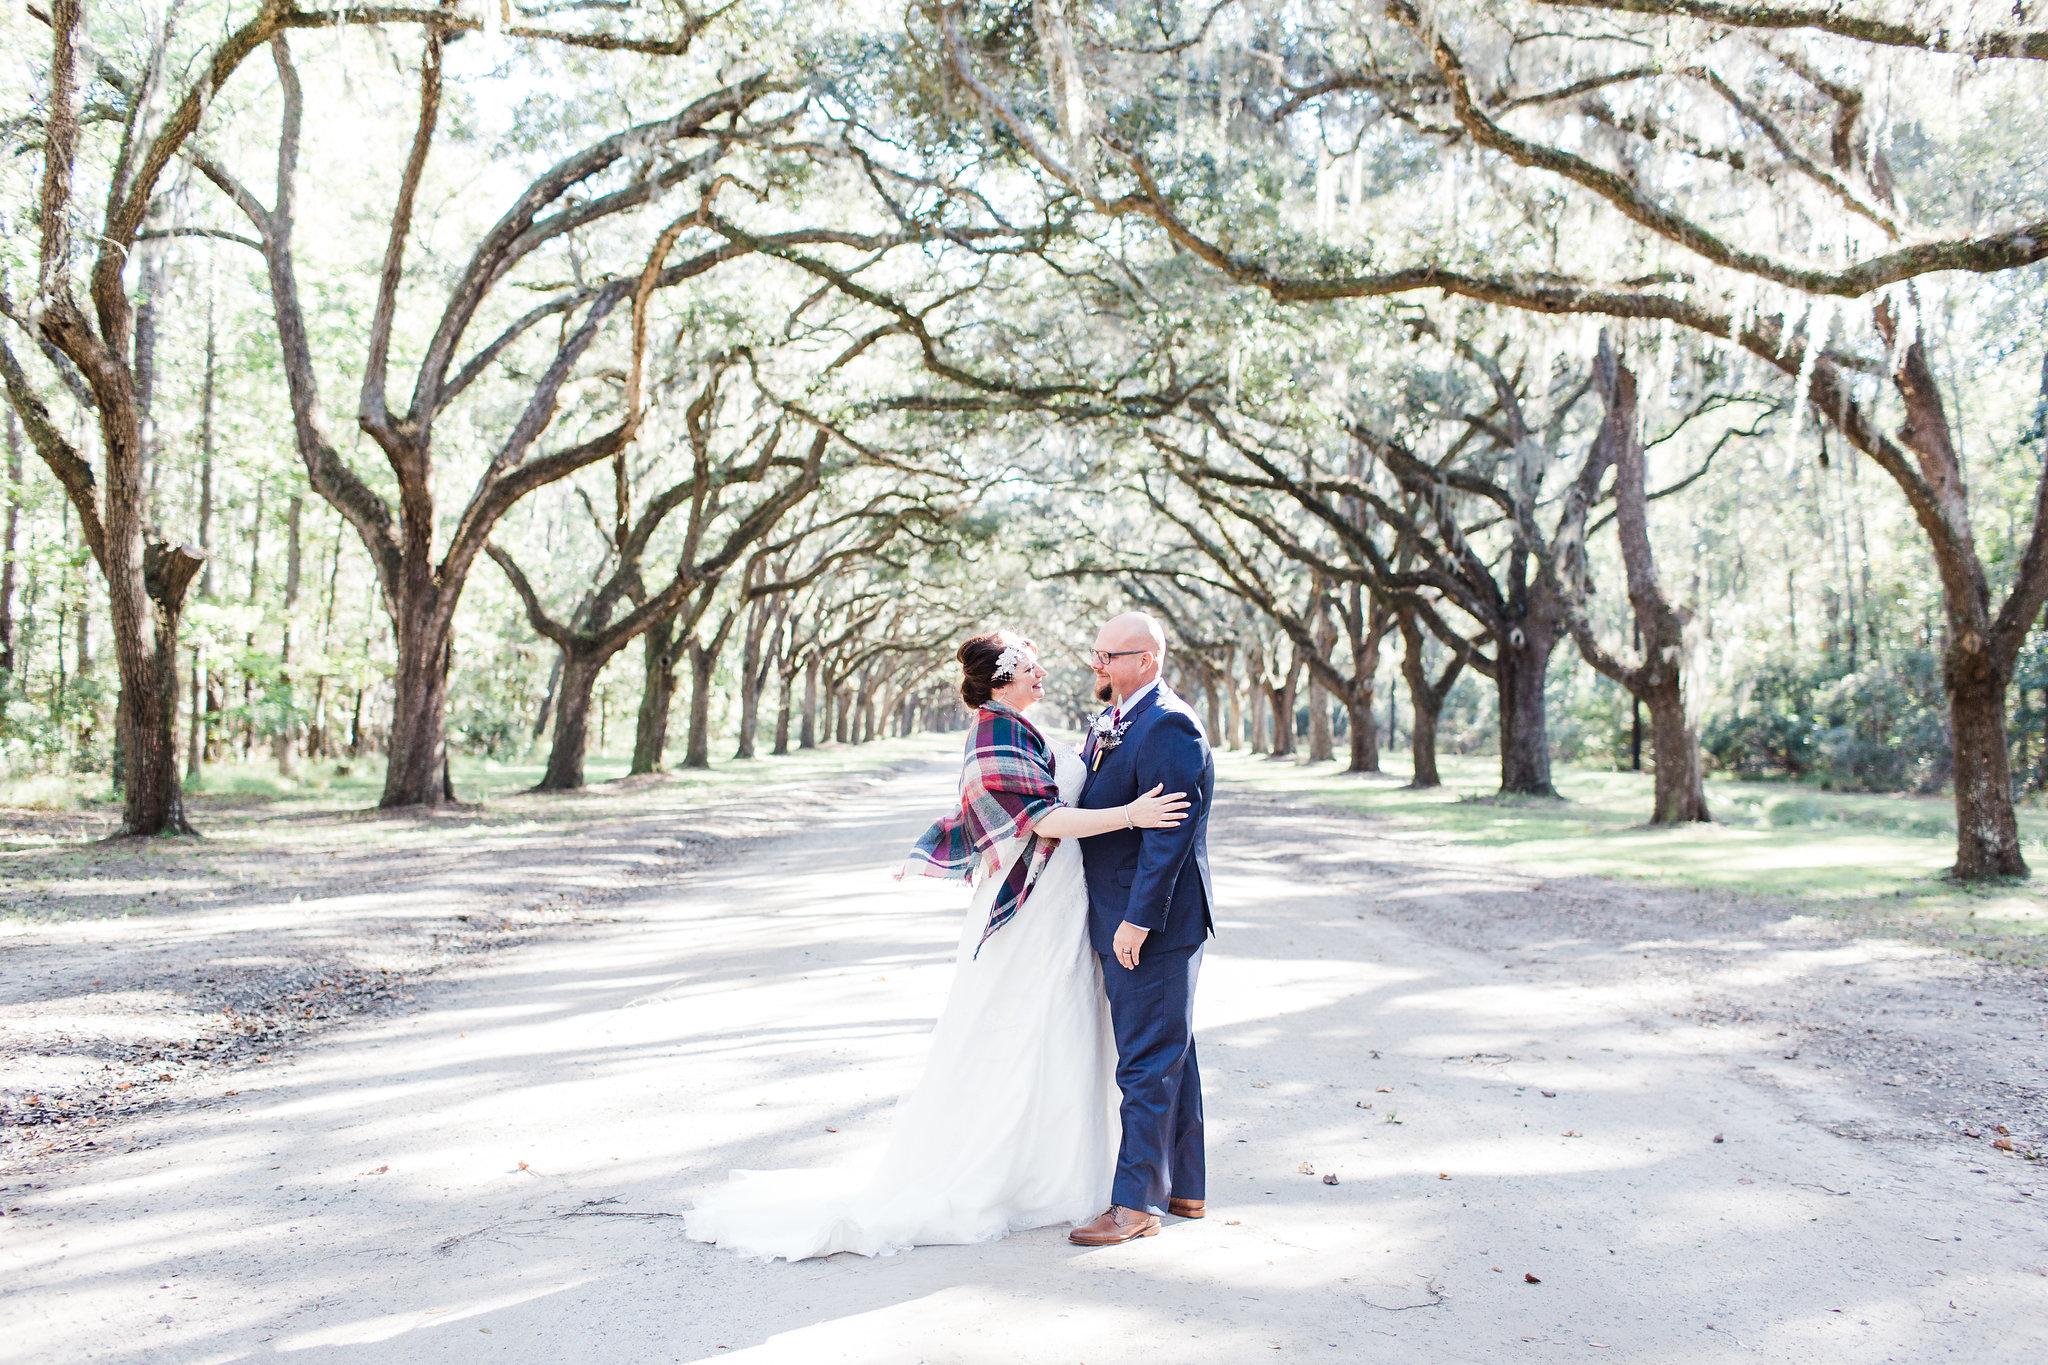 apt-b-photography-kristy-rob-wormsloe-elopment-savannah-wedding-photographer-savannah-elopement-wormsloe-wedding-historic-savannah-elopement-photographer-29.jpg